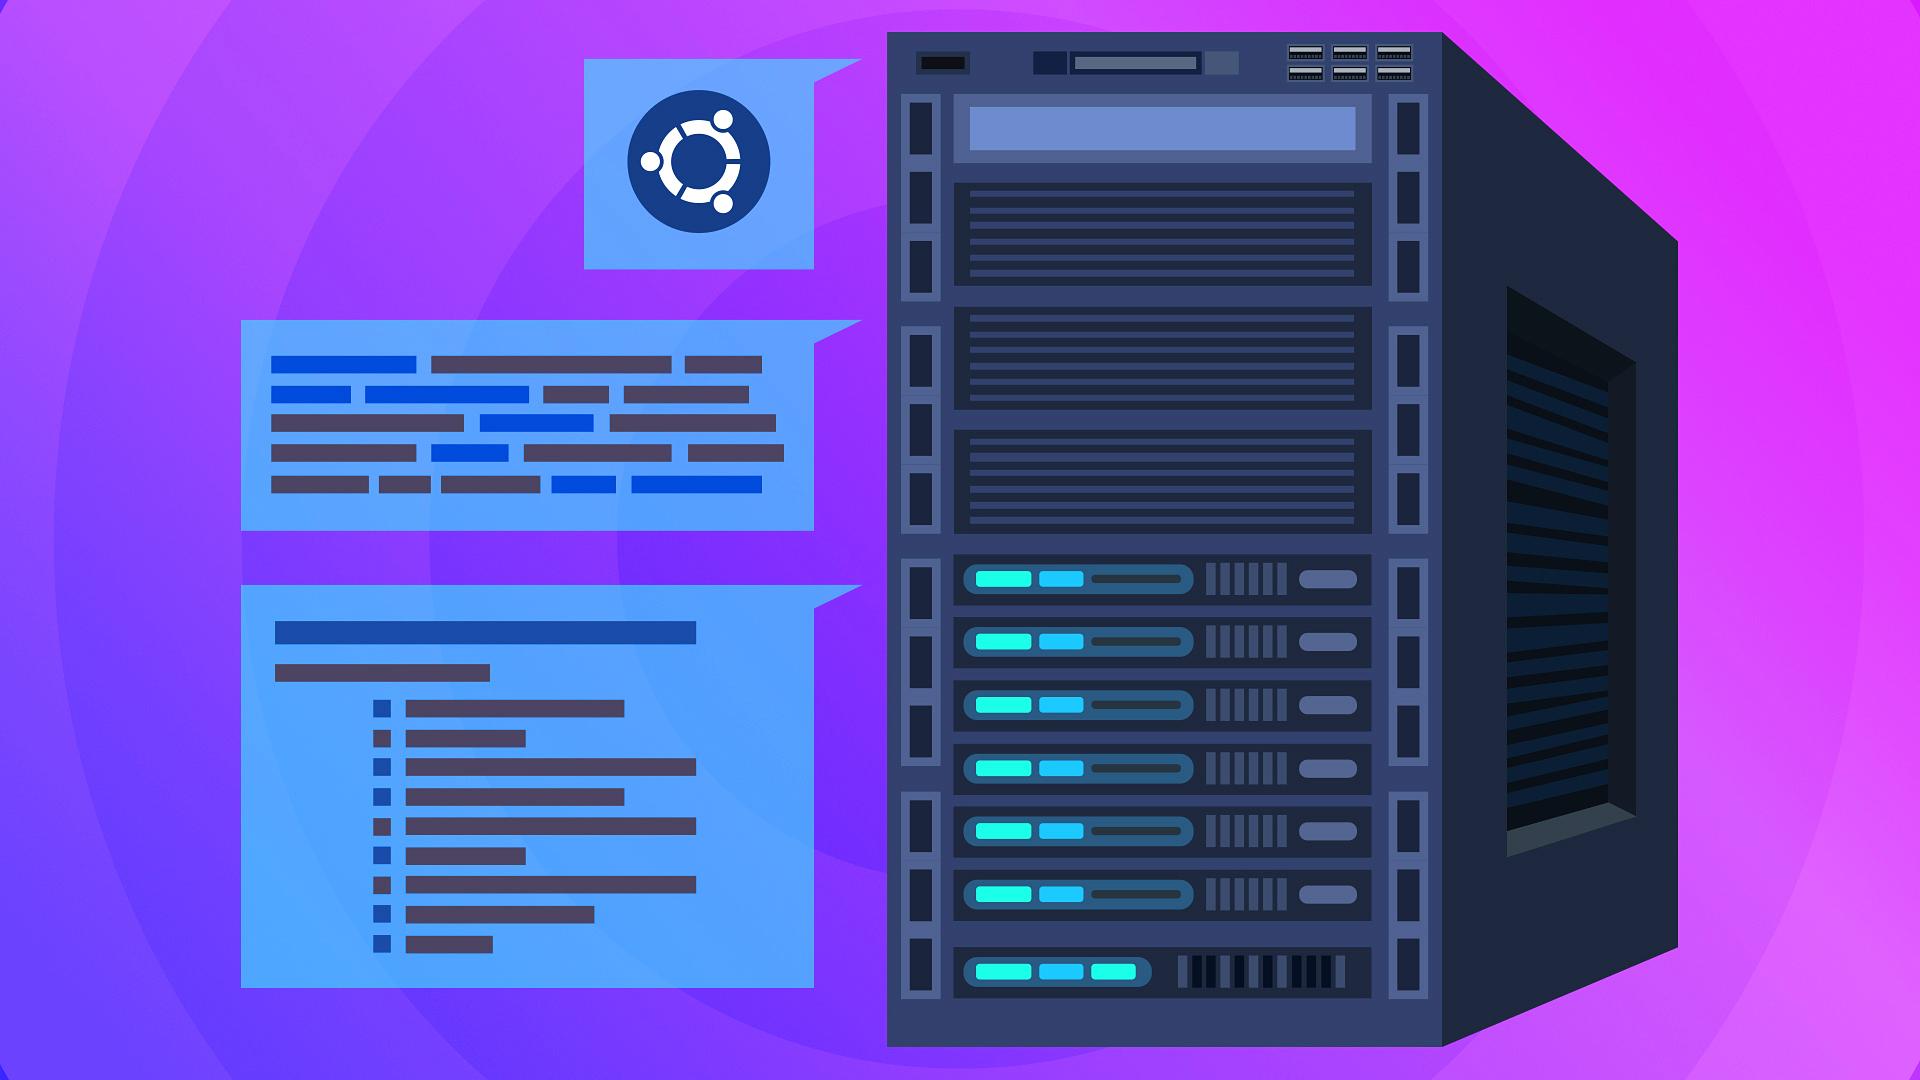 Вебинар Поднимаем свой web-сервер на Ubuntu за 60 минут фото